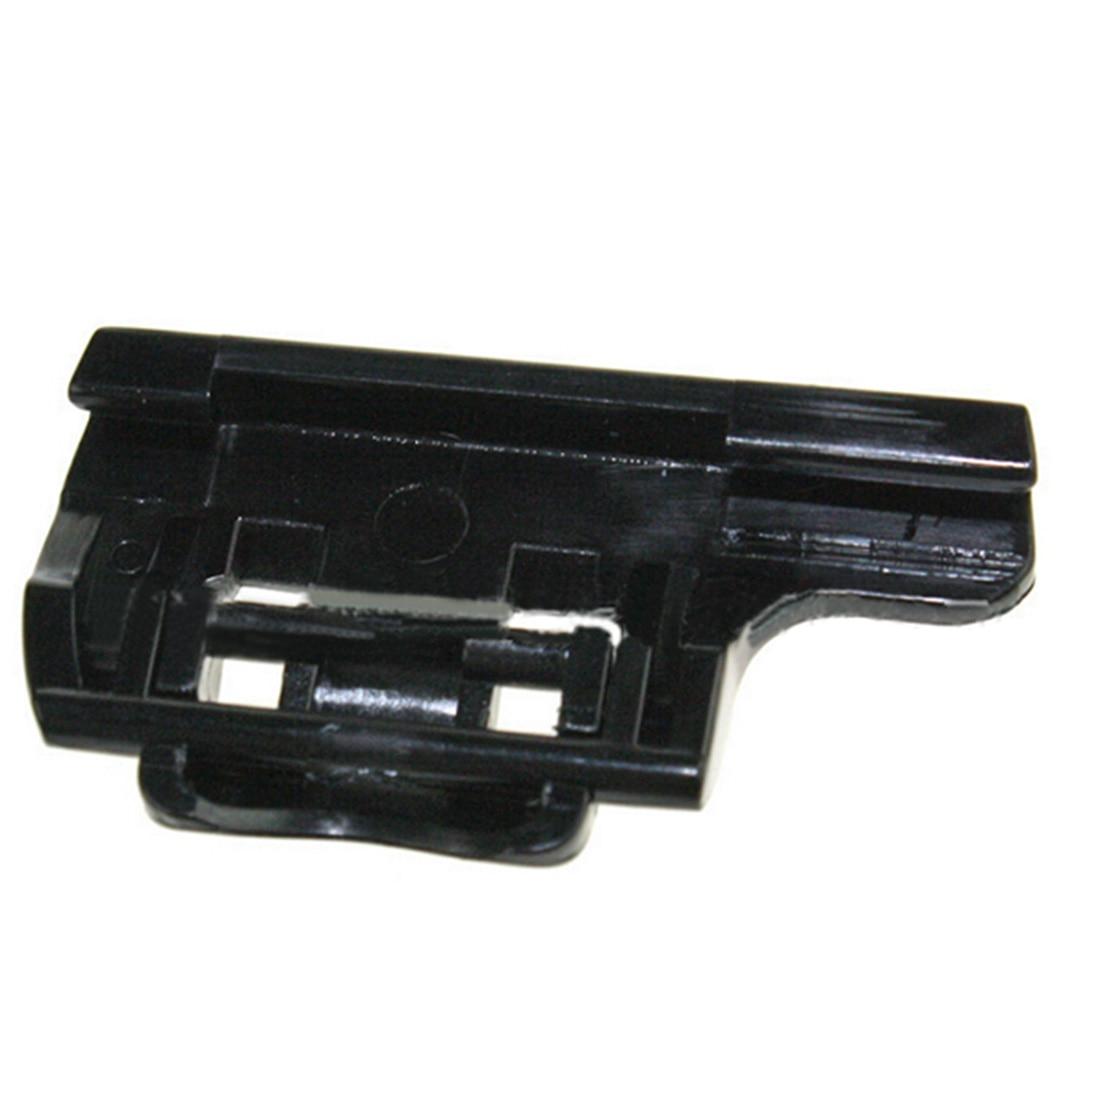 Centechia  Plastic Waterproof Underwater Case Housing Case Lock For GoPro Hero 3/2/1  Top Quality